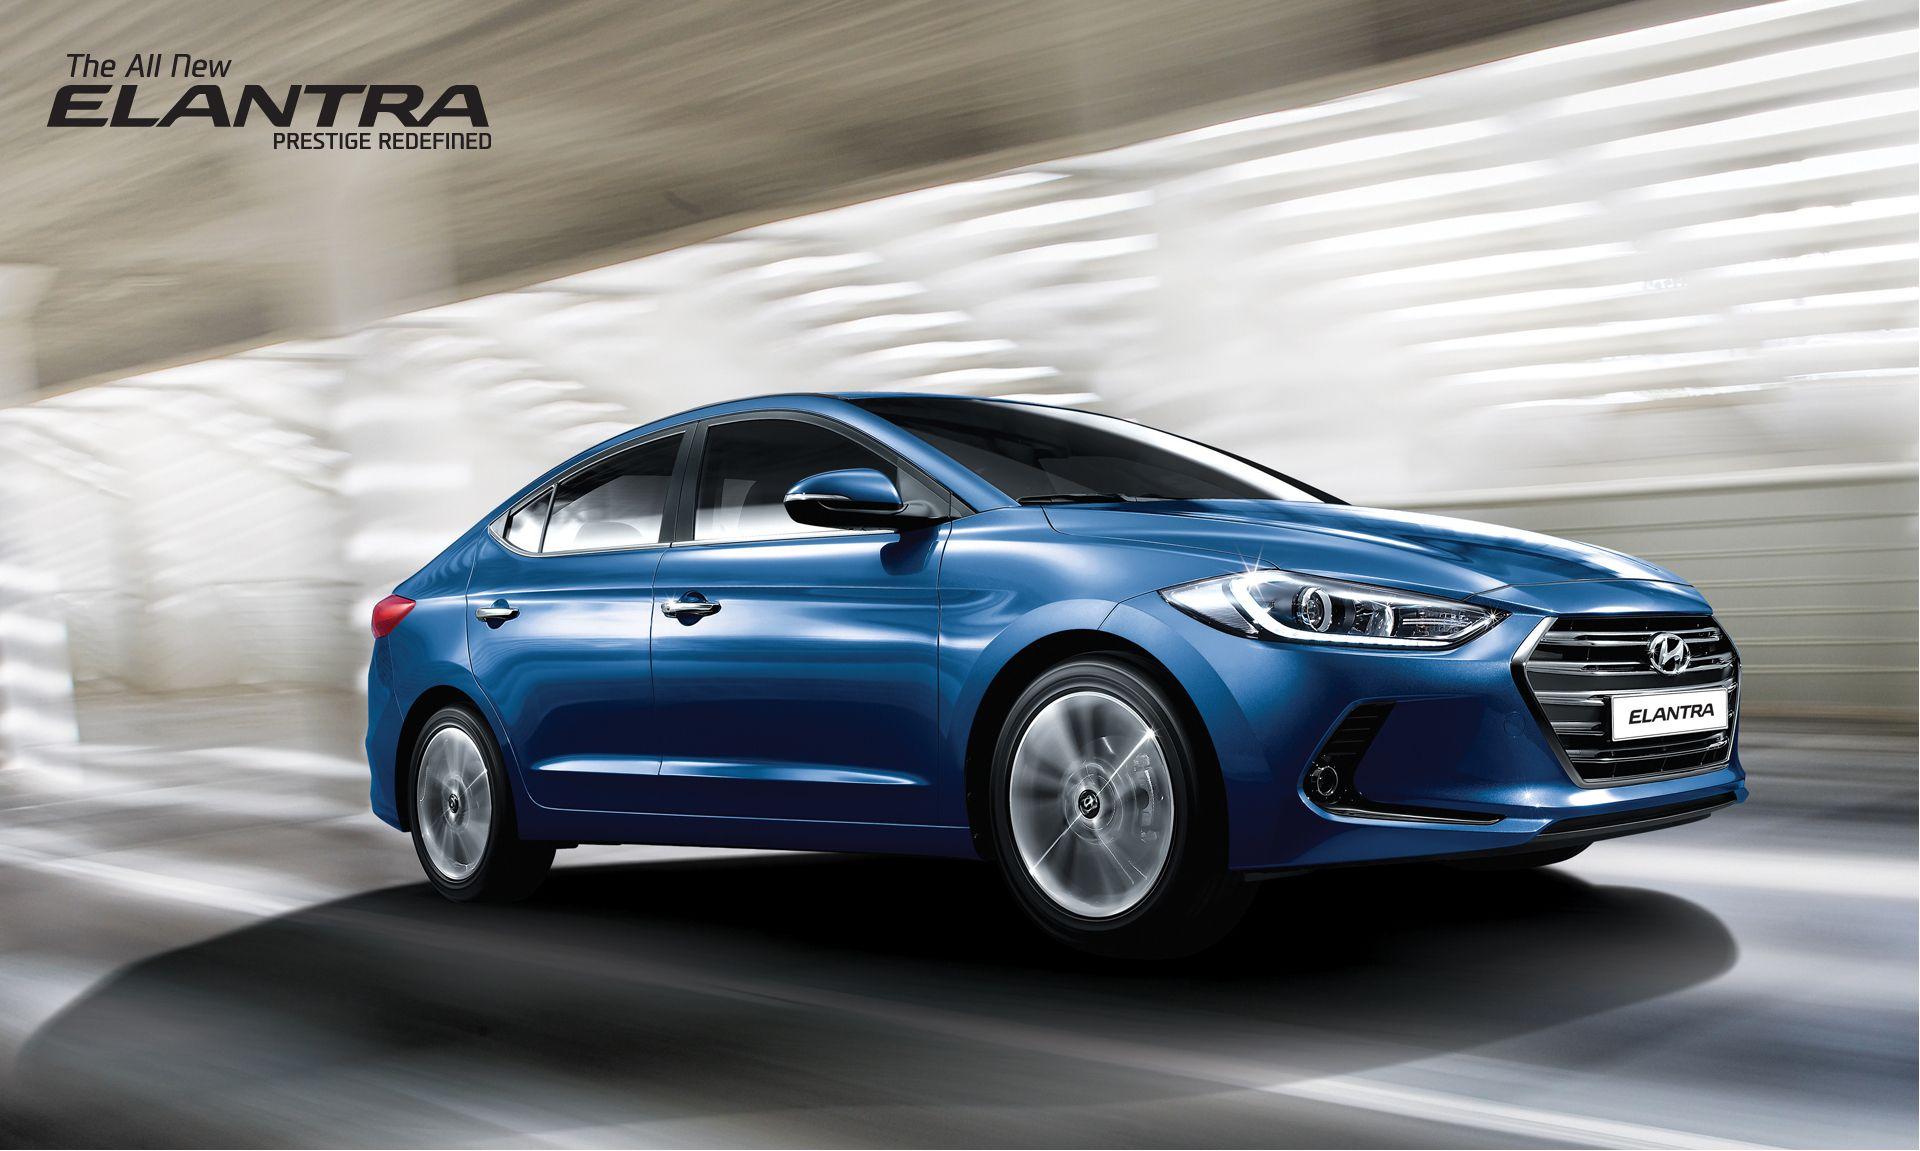 2016 Hyundai Elantra Launched in India at Rs 12.99 lakh